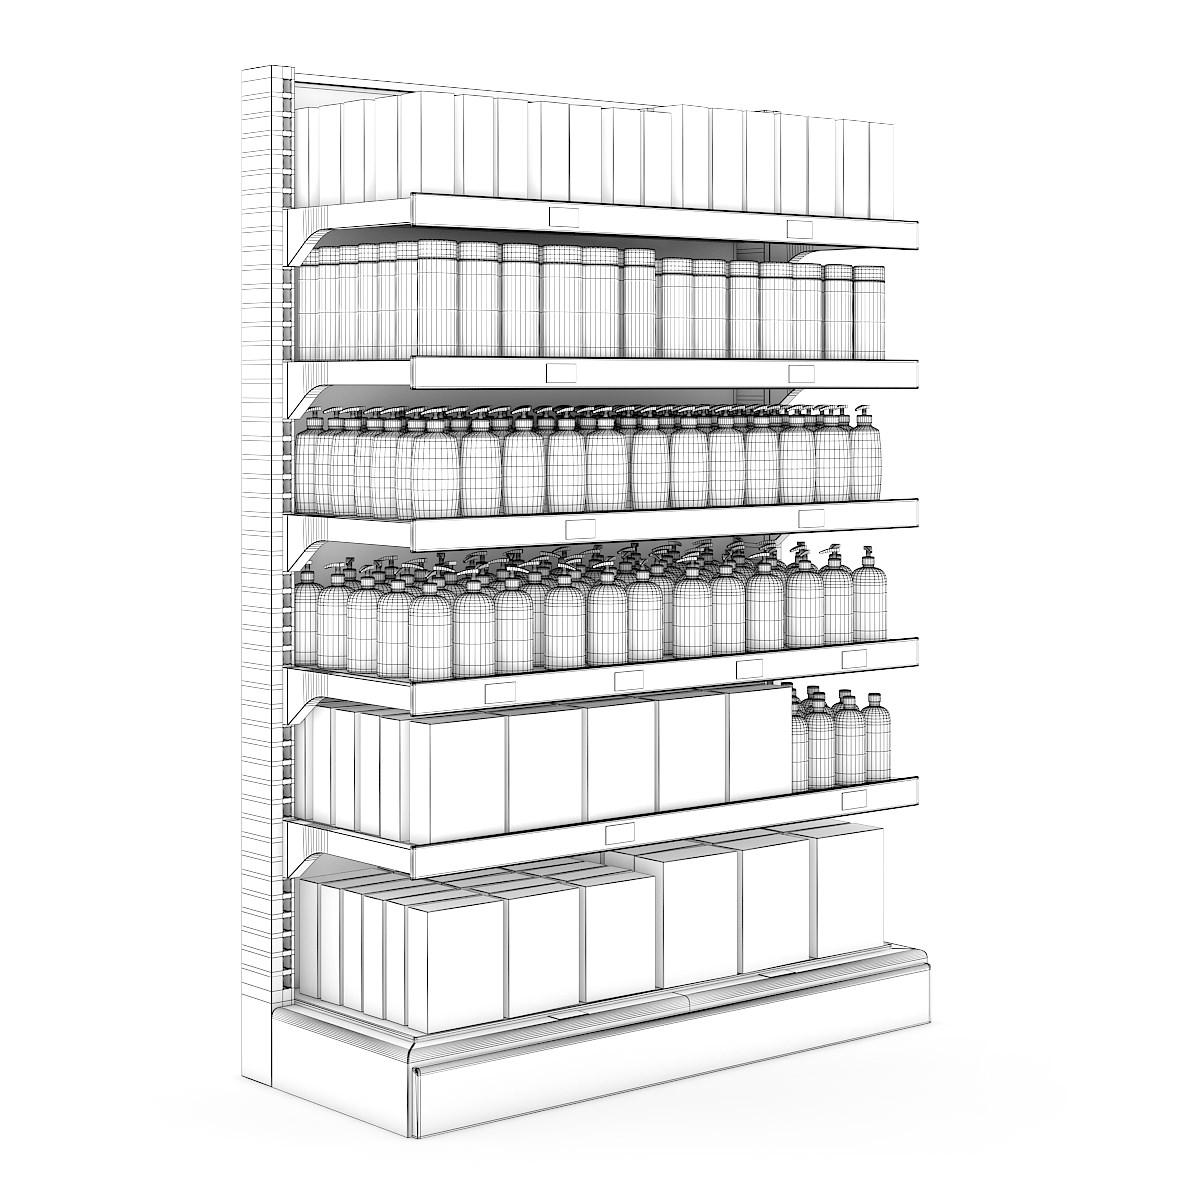 Supermarket Shelf 10 3d Model C4d